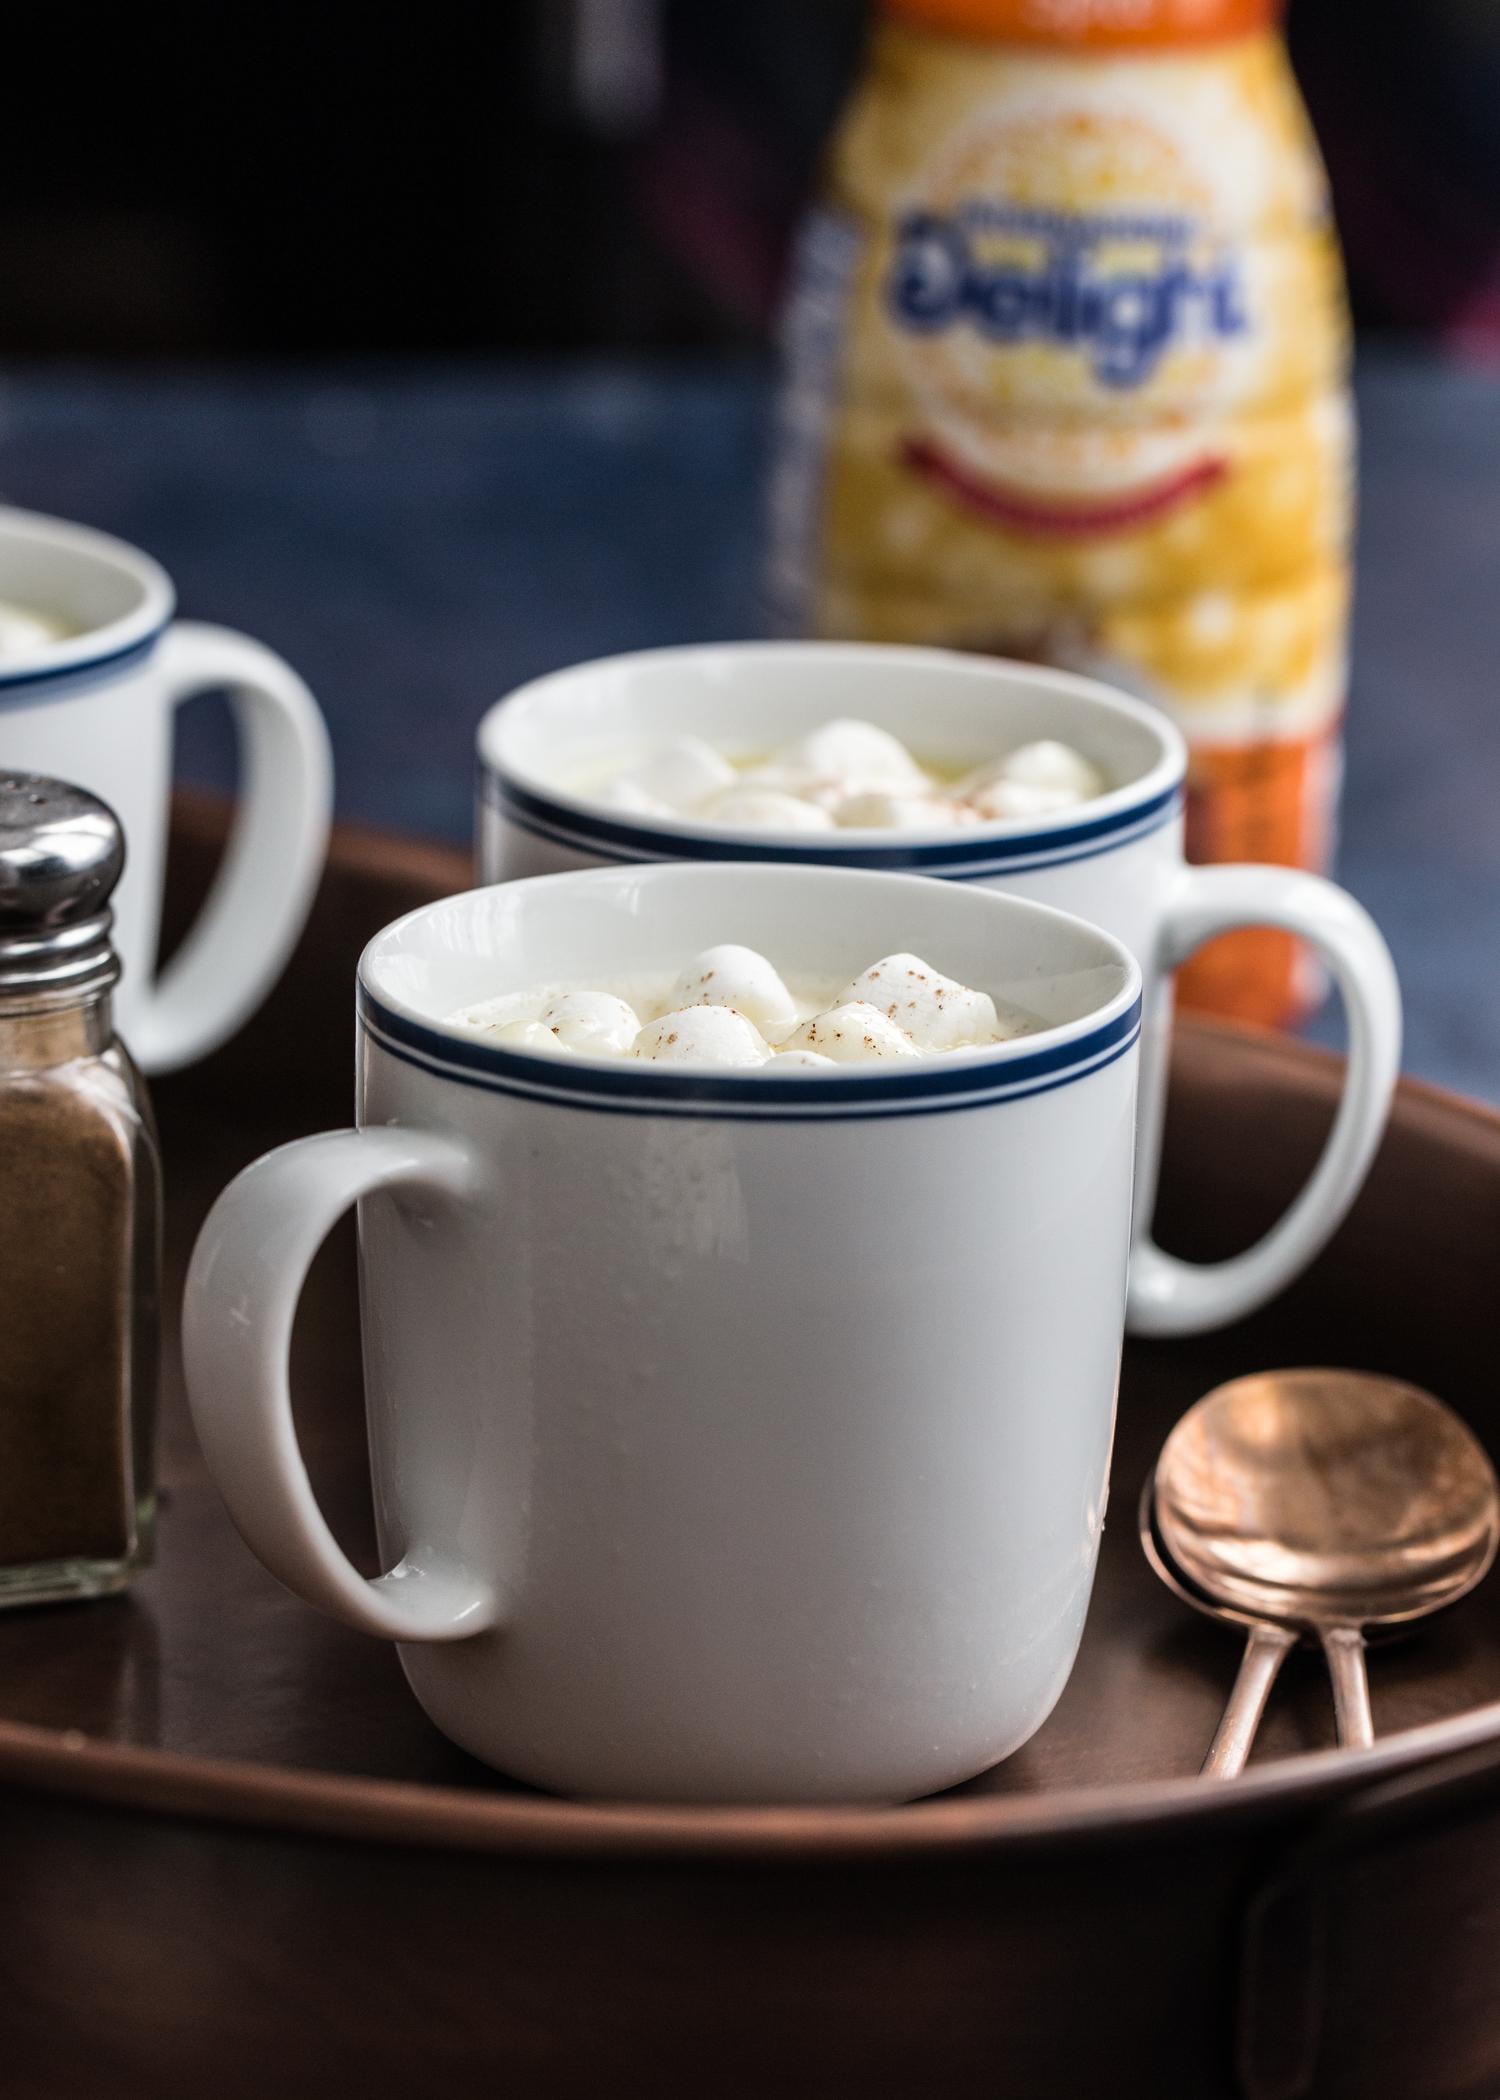 Pumpkin Spice White Hot Chocolate made with International Delight Pumpkin Spice Coffee Creamer